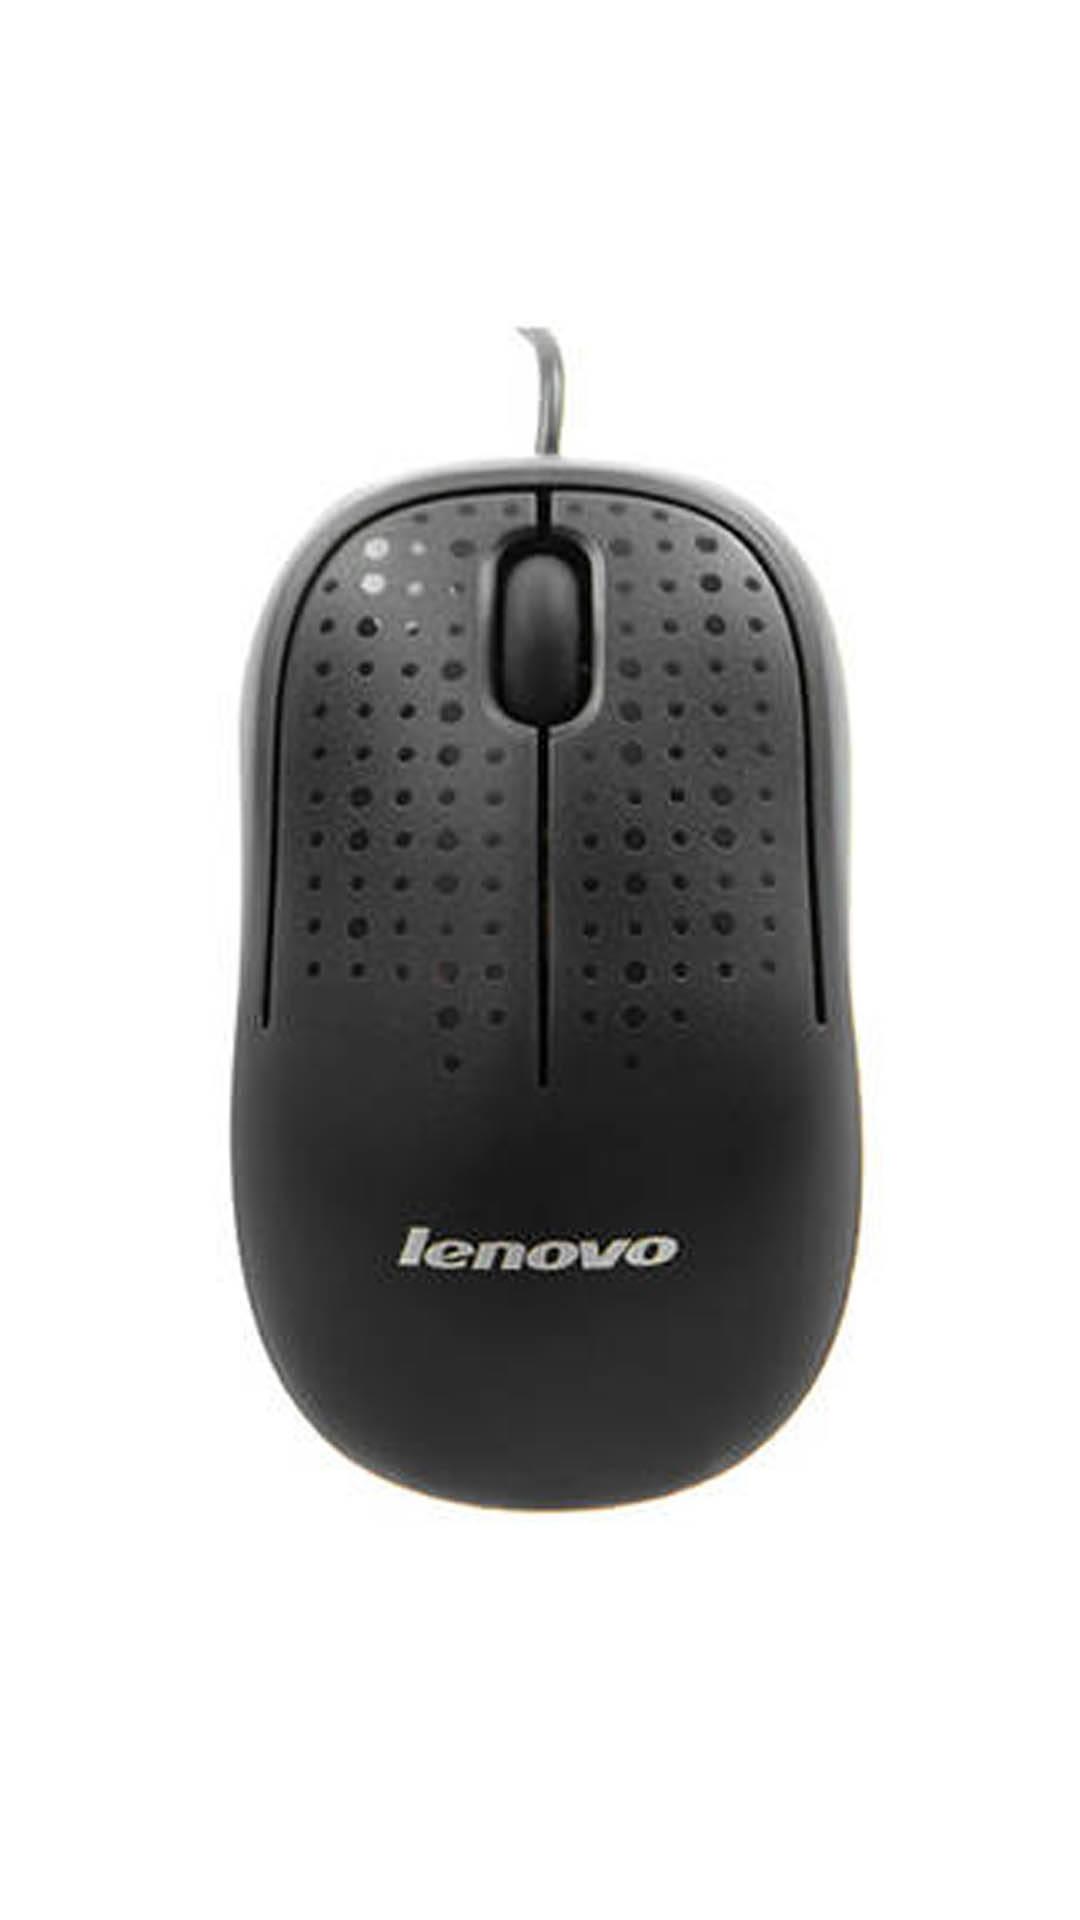 25a2081ebdc LENOVO M110 OPTICAL MOUSE Reviews, LENOVO M110 OPTICAL MOUSE Price ...